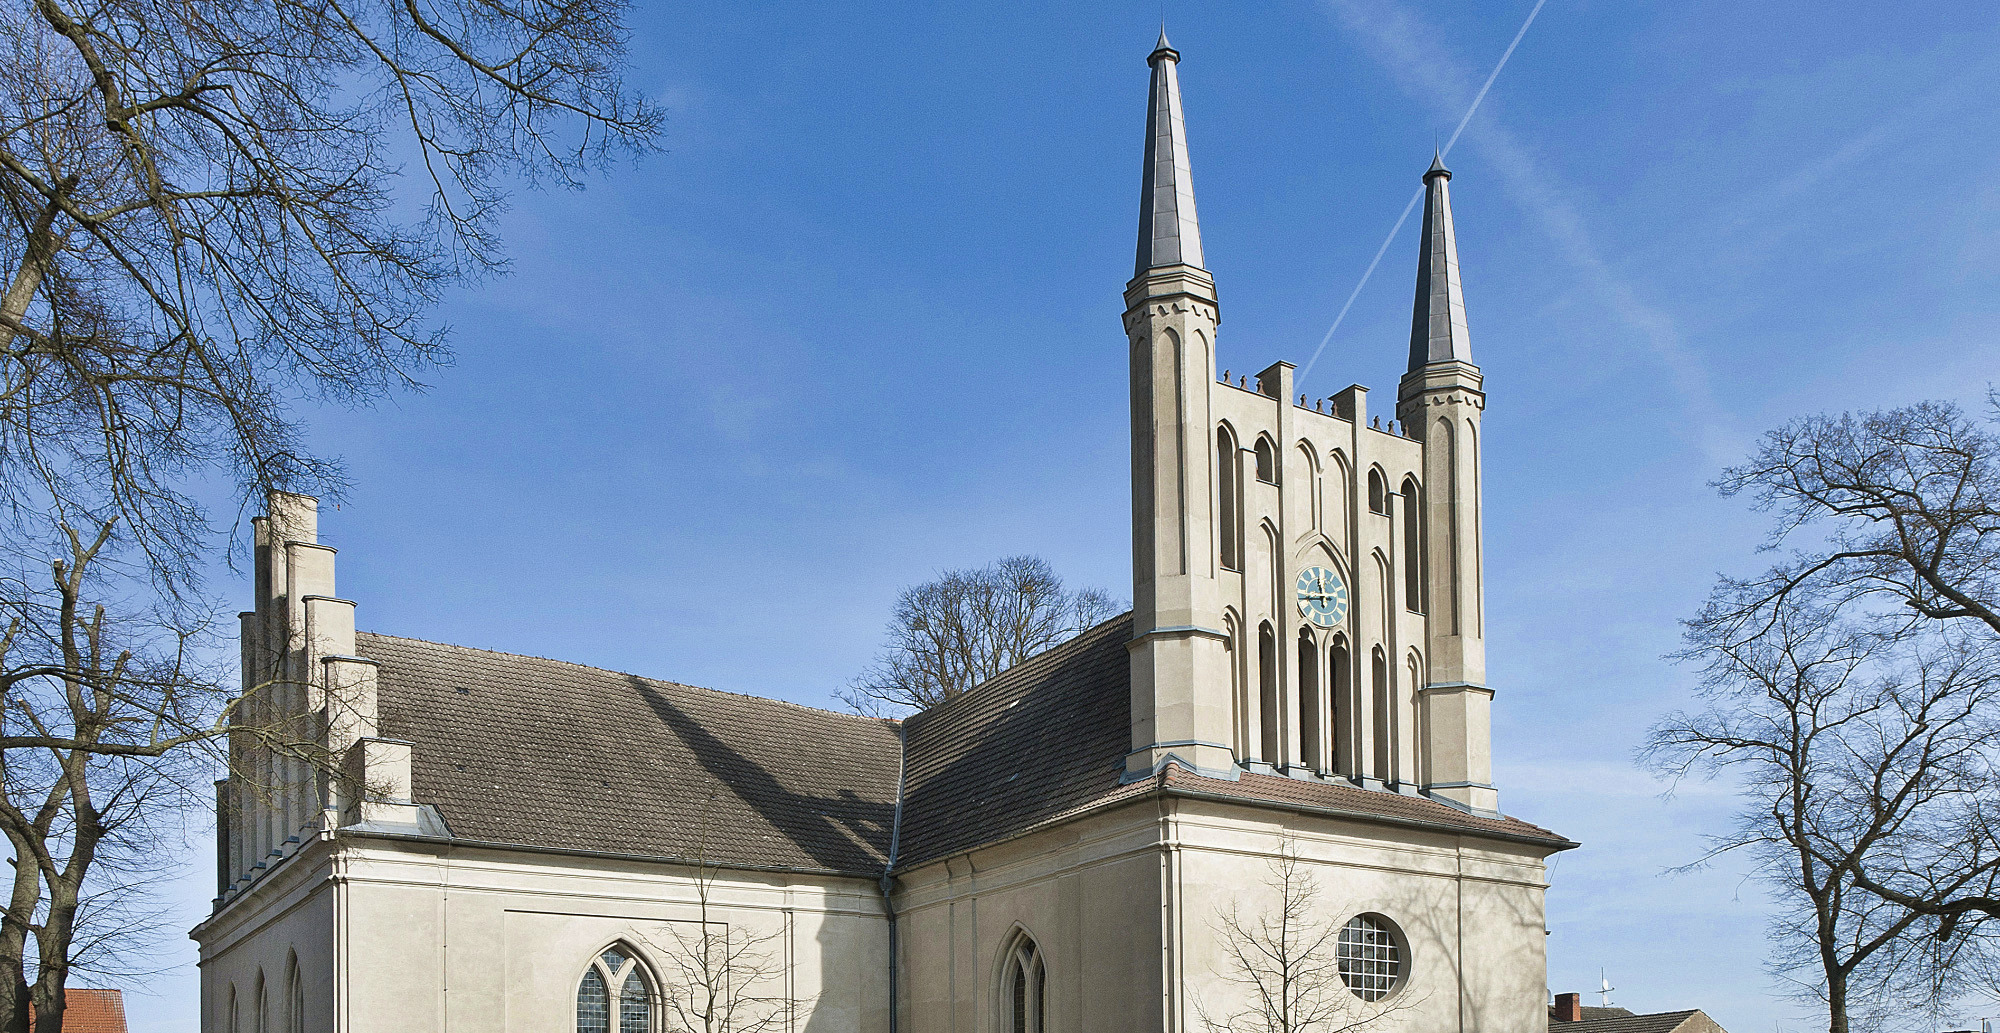 Kirchen sind tolle Denkmäler, z.B. die Stadtkirche Joachimsthal in Brandenburg